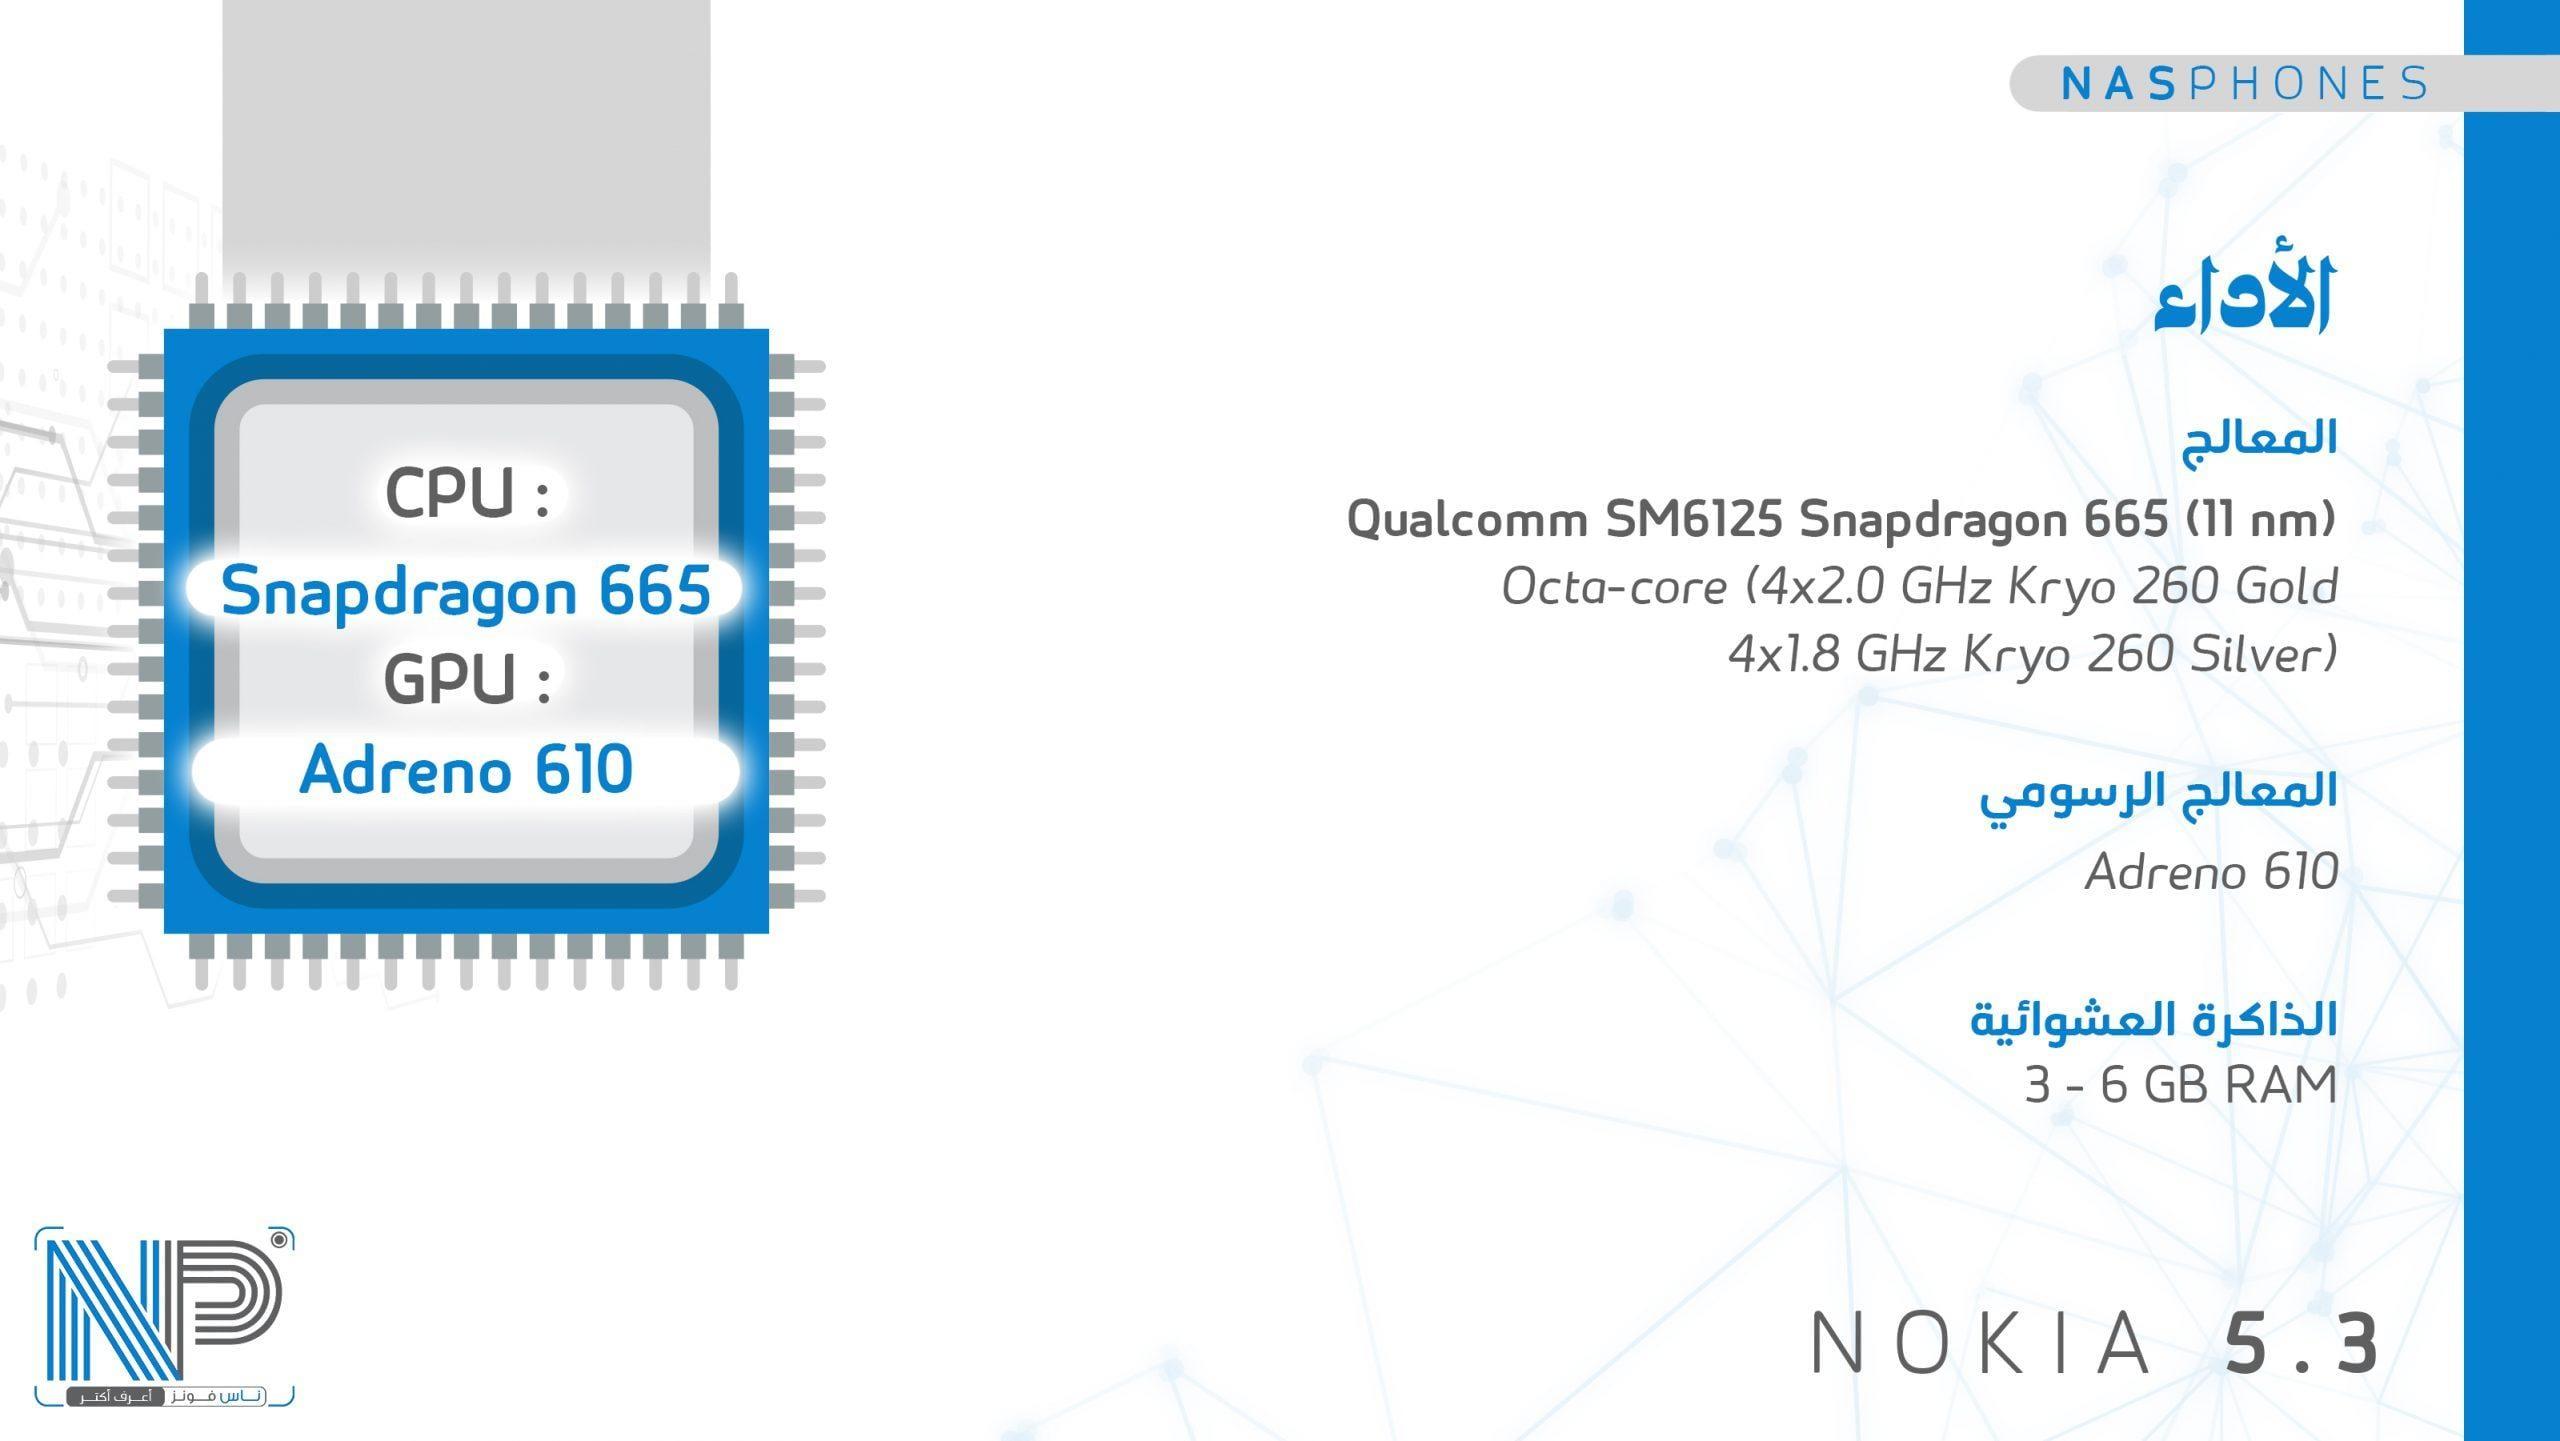 أداء موبايل Nokia 5.3